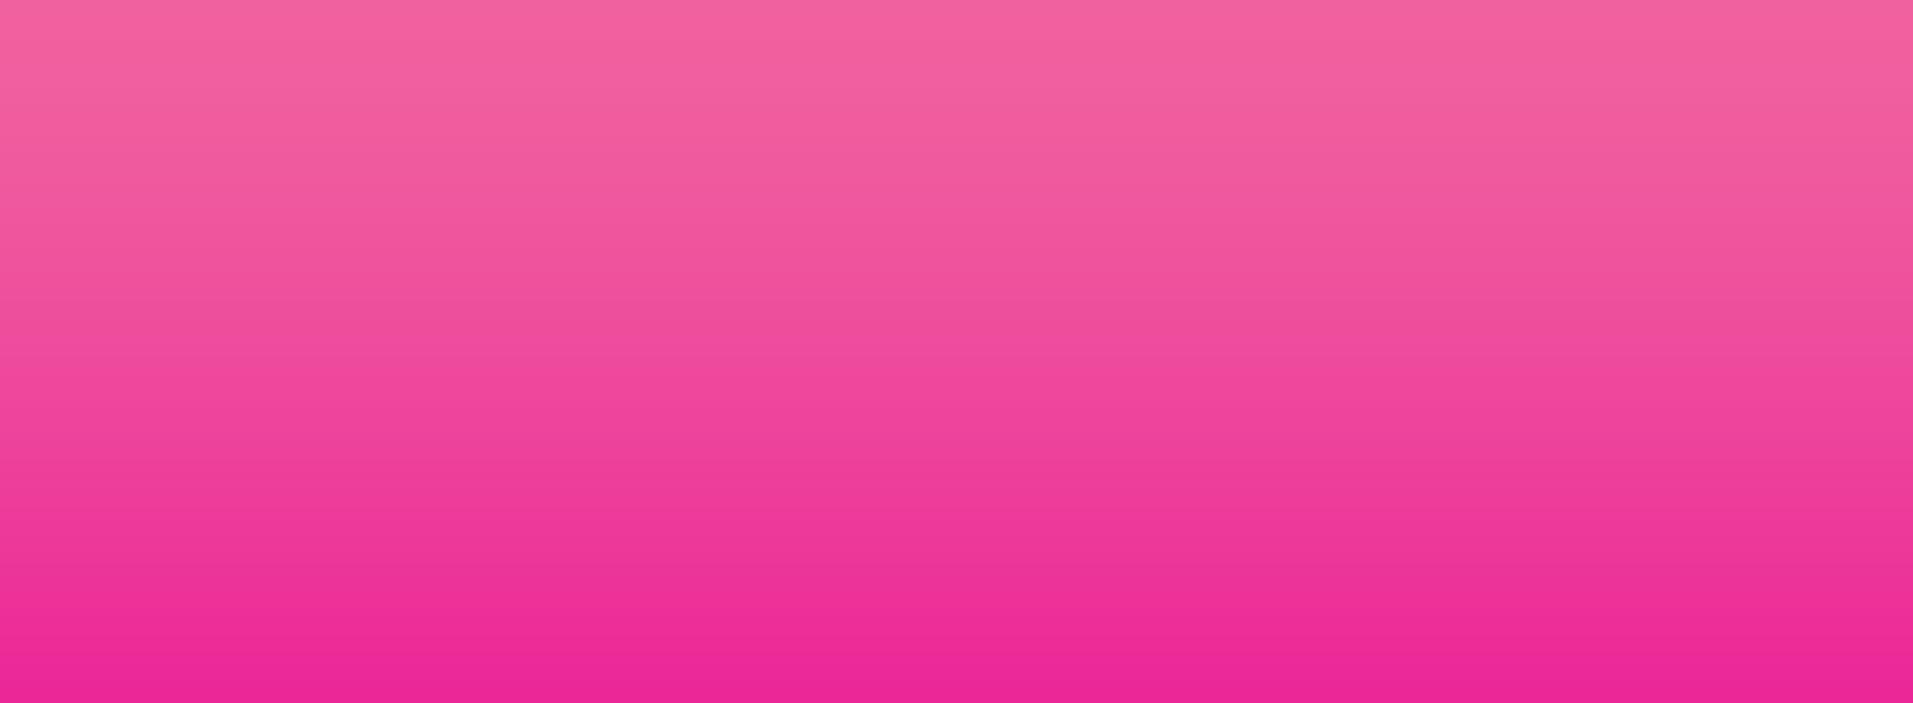 whitepaper-pink-bg-1913x703